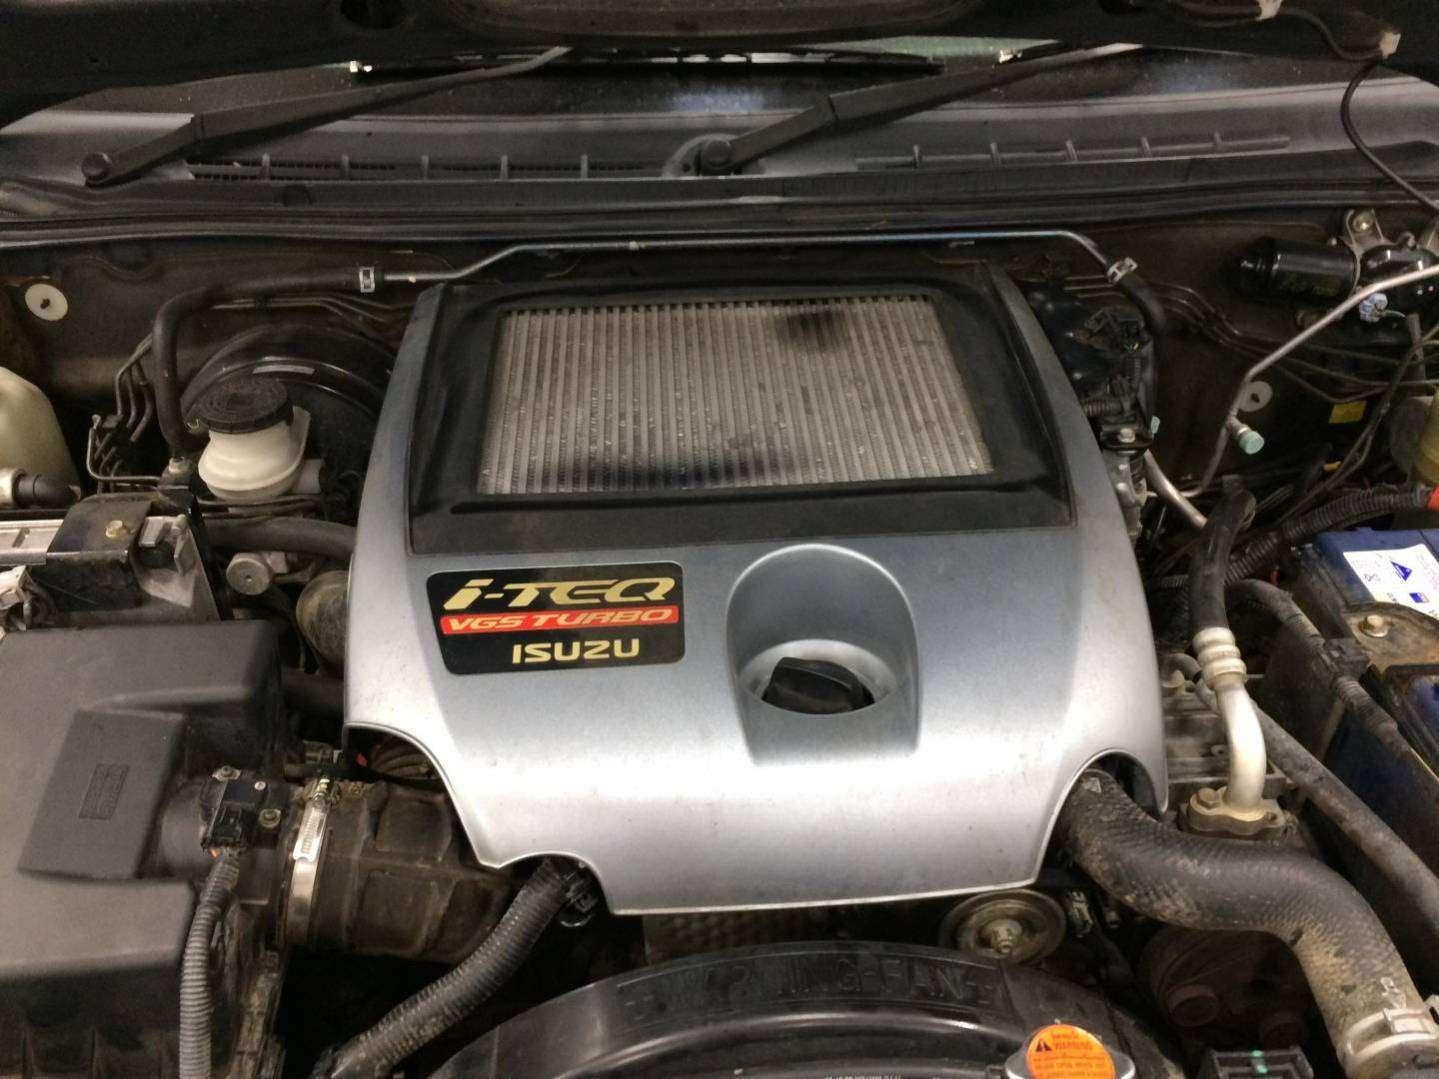 Isuzu D-Max 2009 3L ecu remap tuning - Diesel Tuning Australia